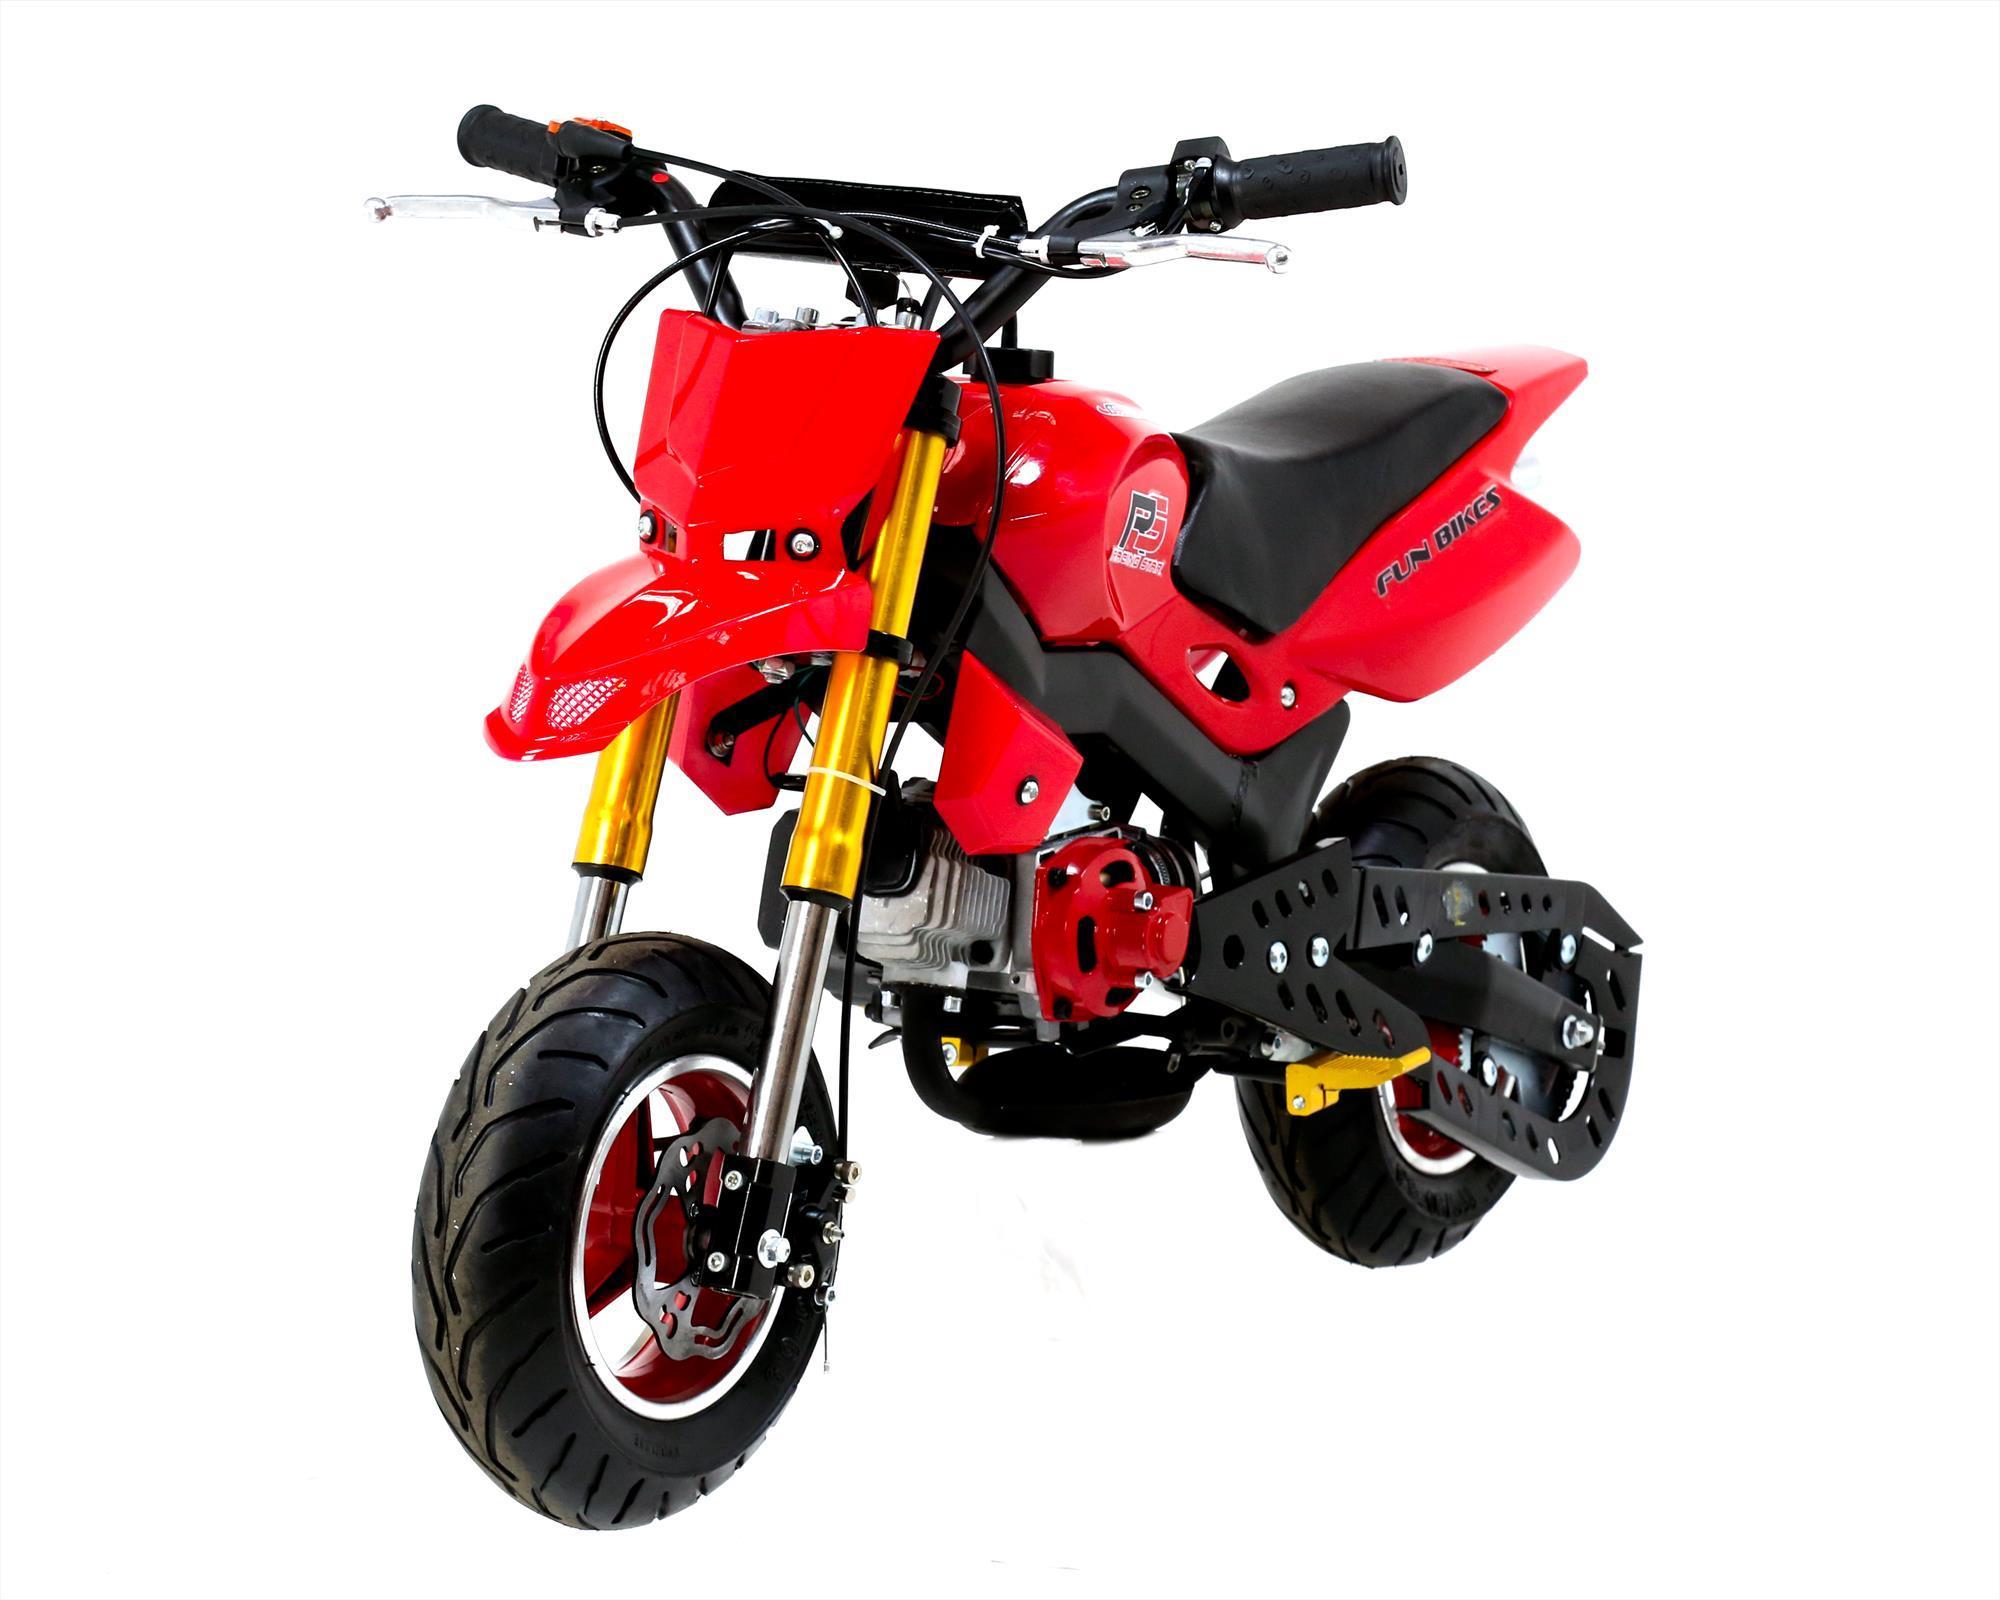 funbikes super motard 50cc 48cm petrol red mini moto bike. Black Bedroom Furniture Sets. Home Design Ideas